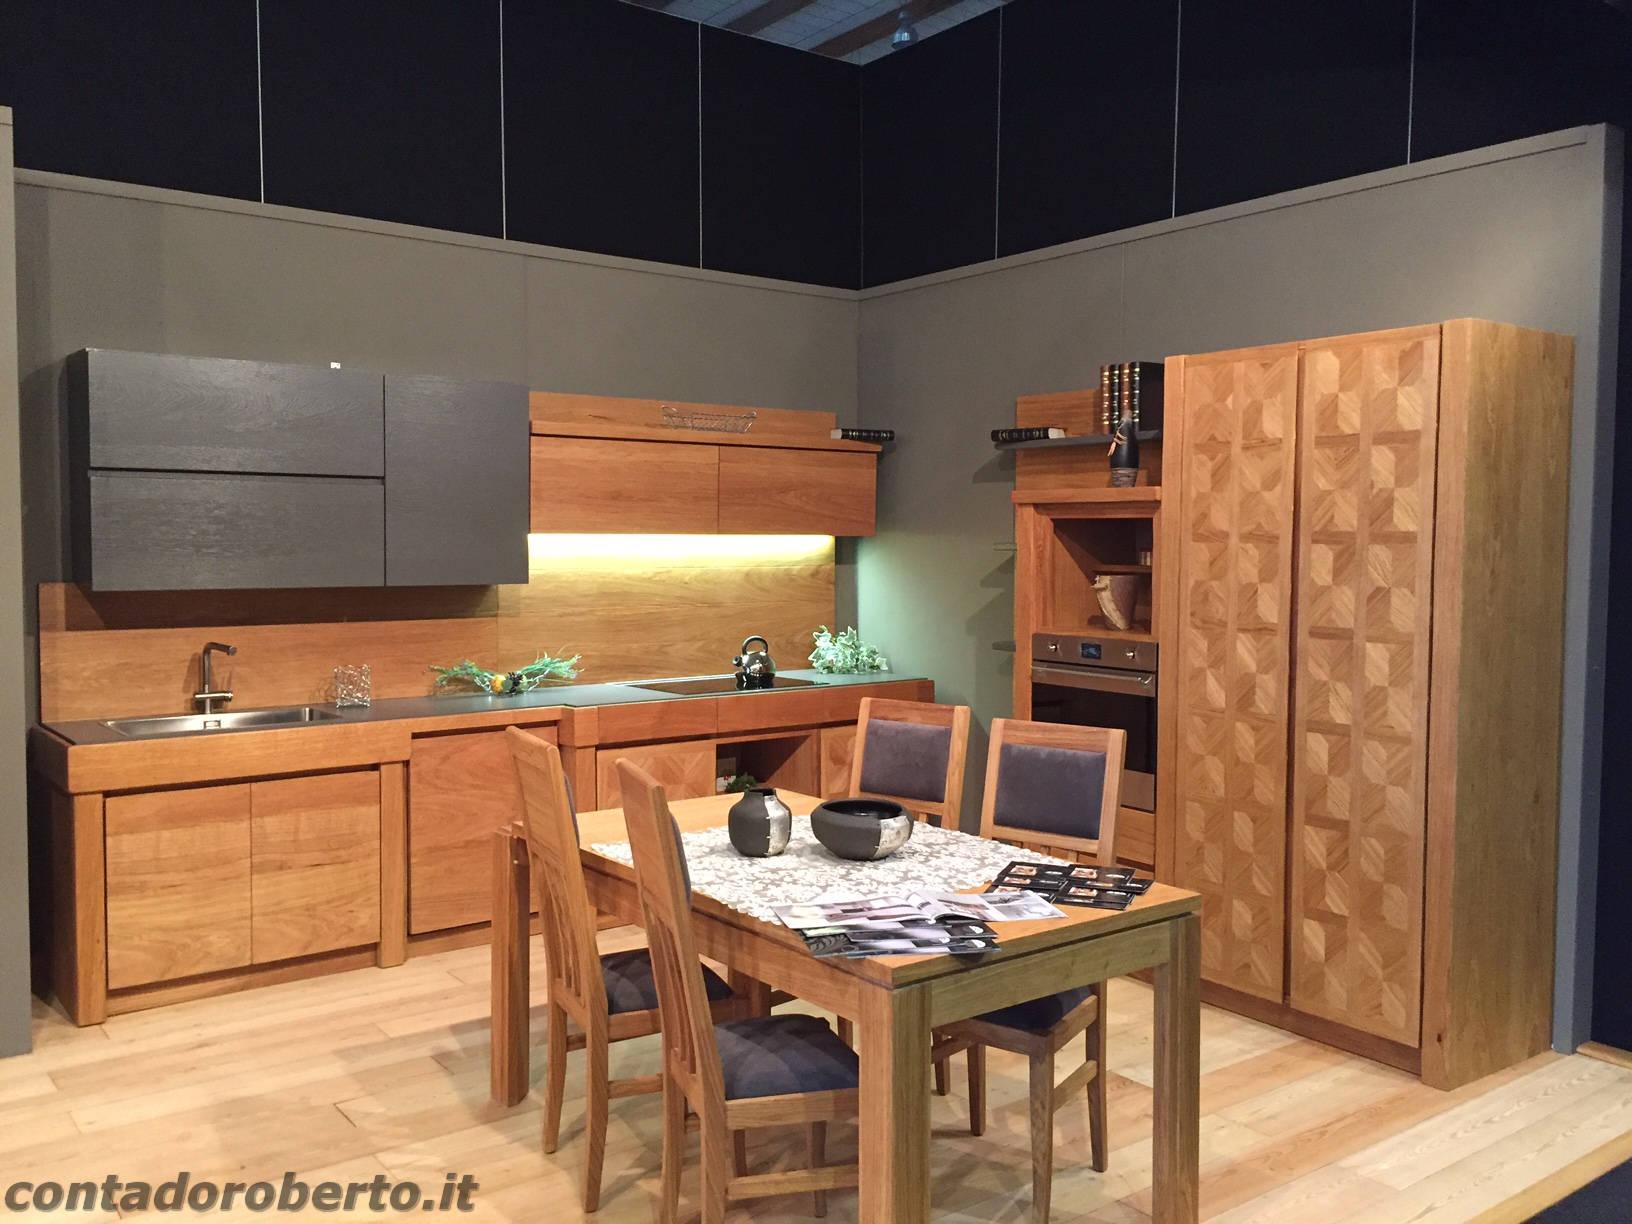 Cucina Moderna in Rovere Naturale Manerba  Contado Roberto Group  Cucine e arredamenti su